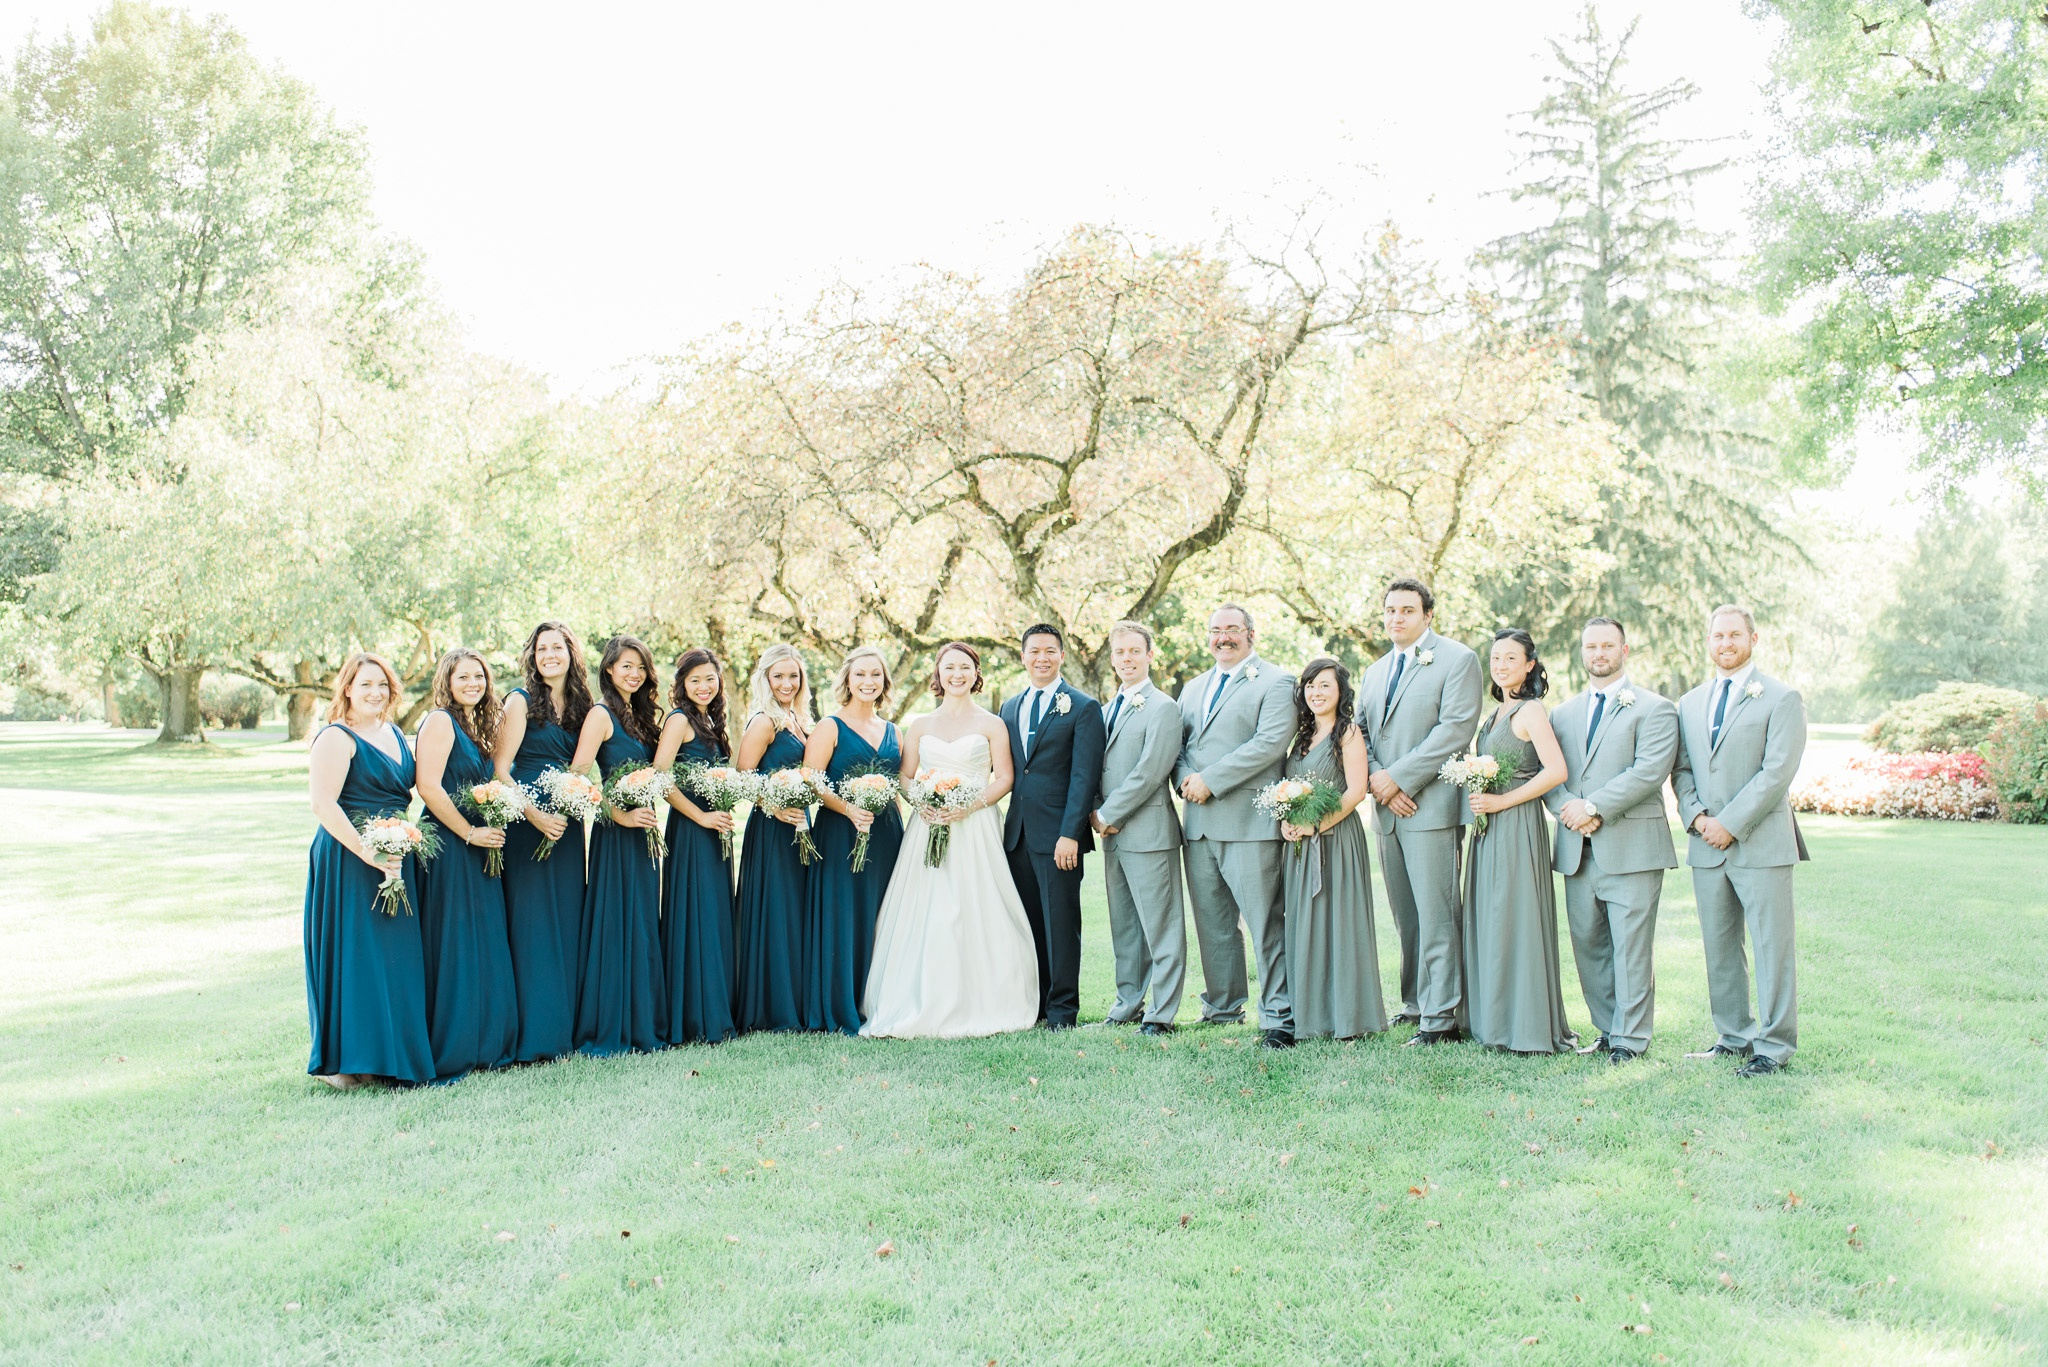 brookside-golf-country-club-wedding-columbus-ohio-75.jpg